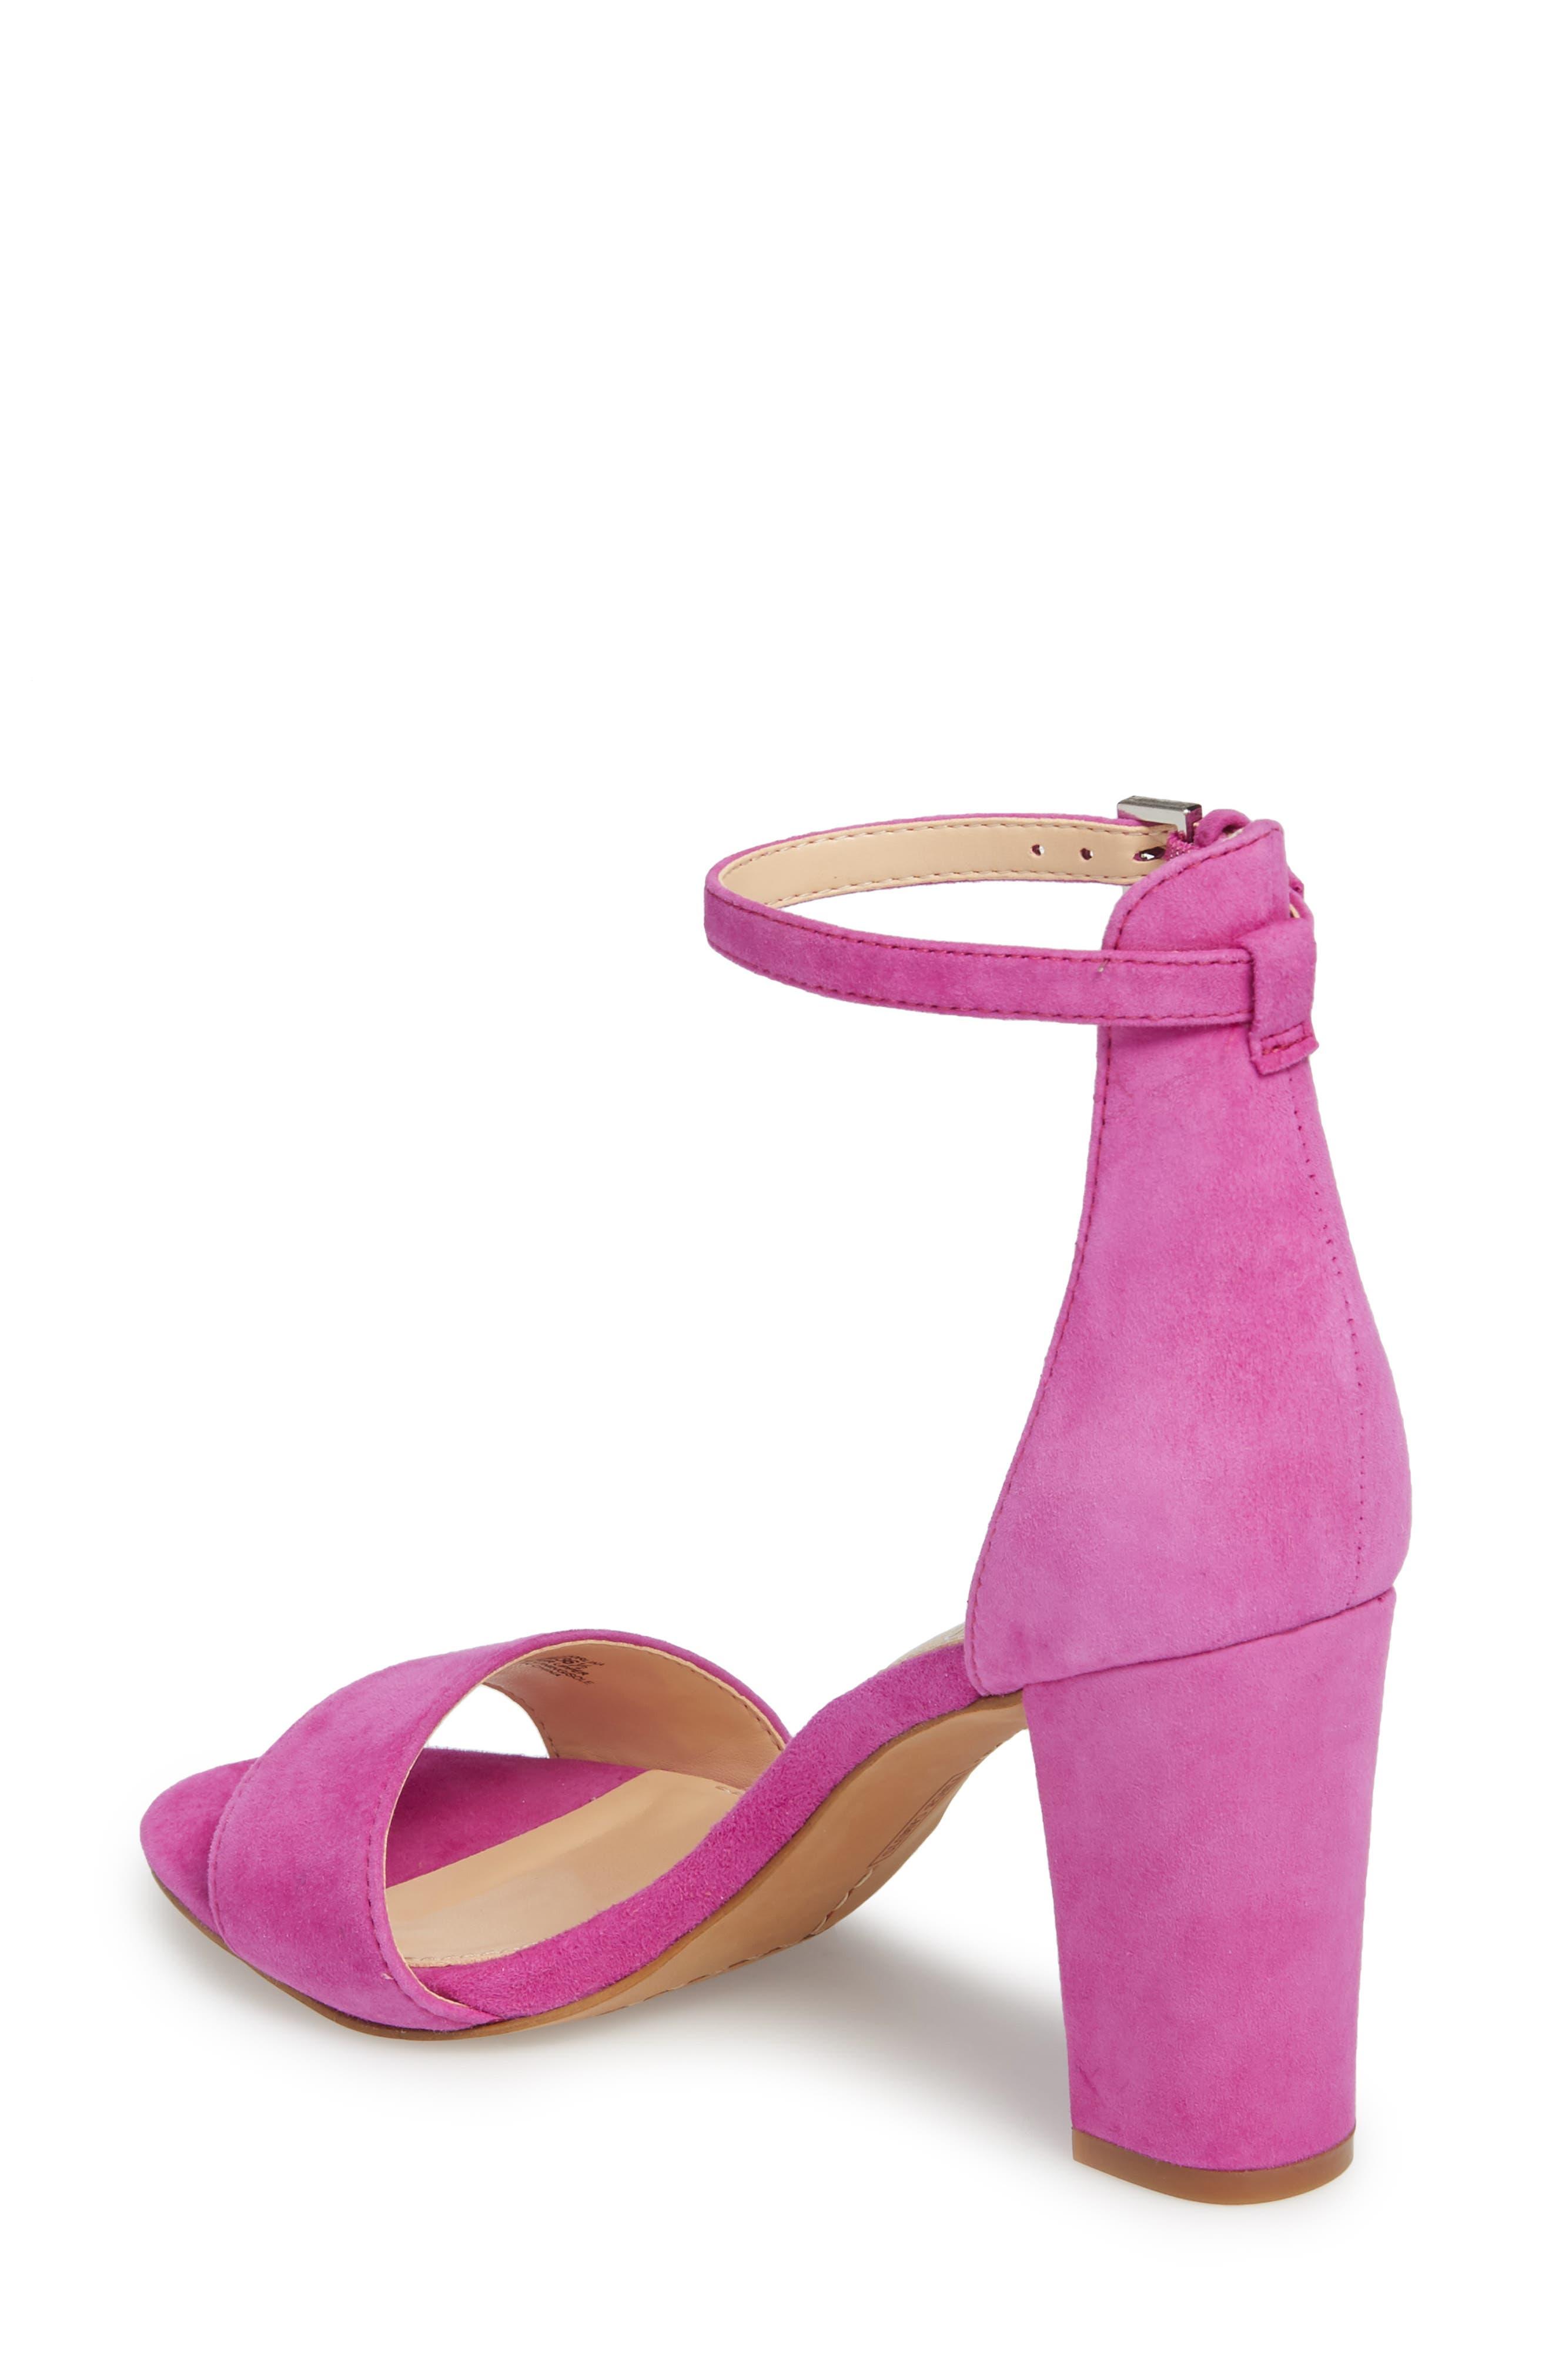 Corlina Ankle Strap Sandal,                             Alternate thumbnail 2, color,                             Drama Pink Suede